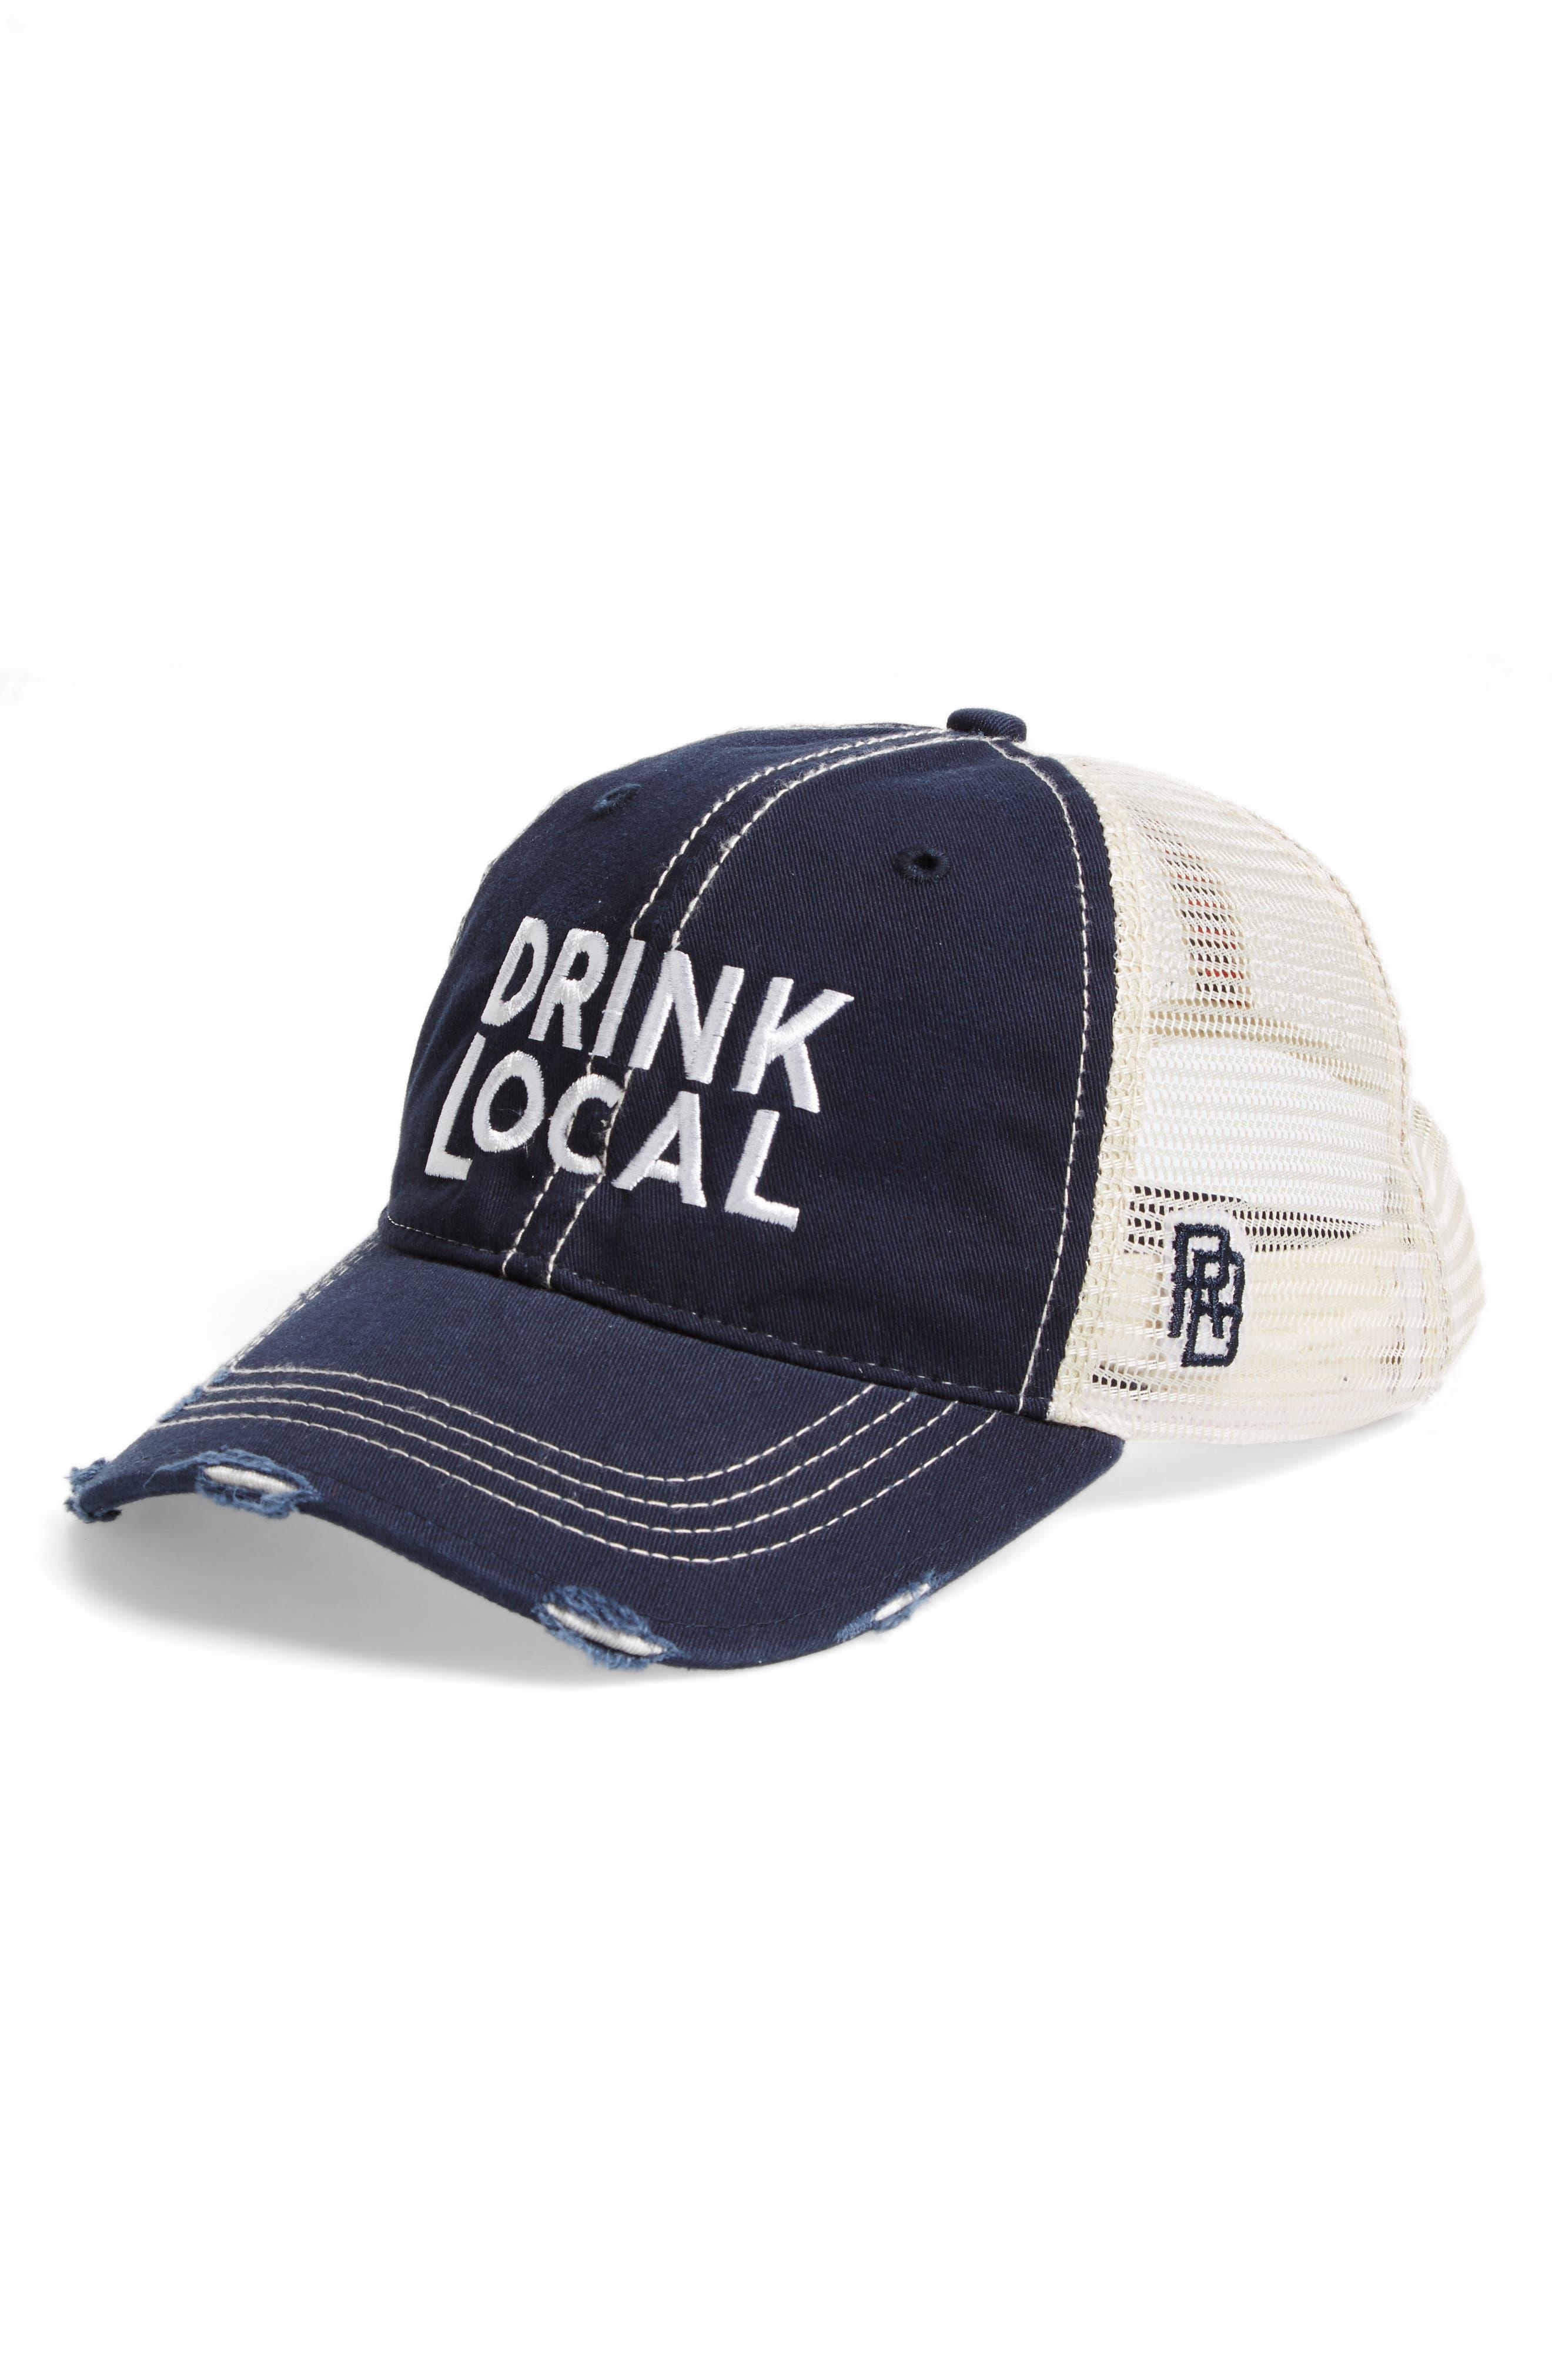 Original Retro Brand Drink Local Trucker Hat